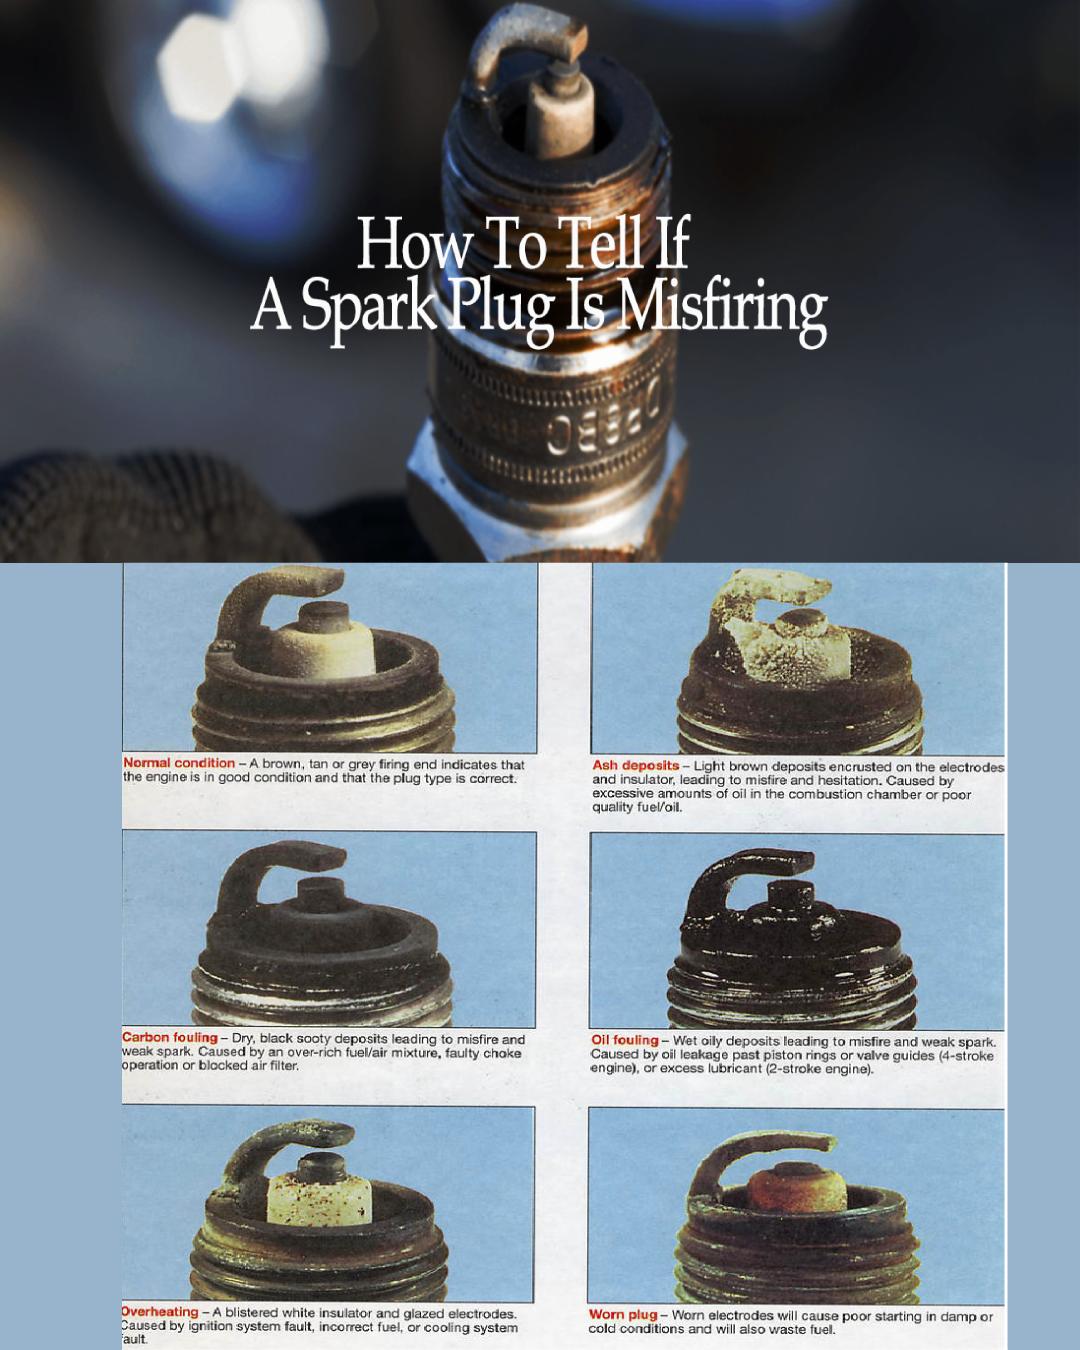 How To Tell If A Spark Plug Is Misfiring Spark Plug Spark Plugs